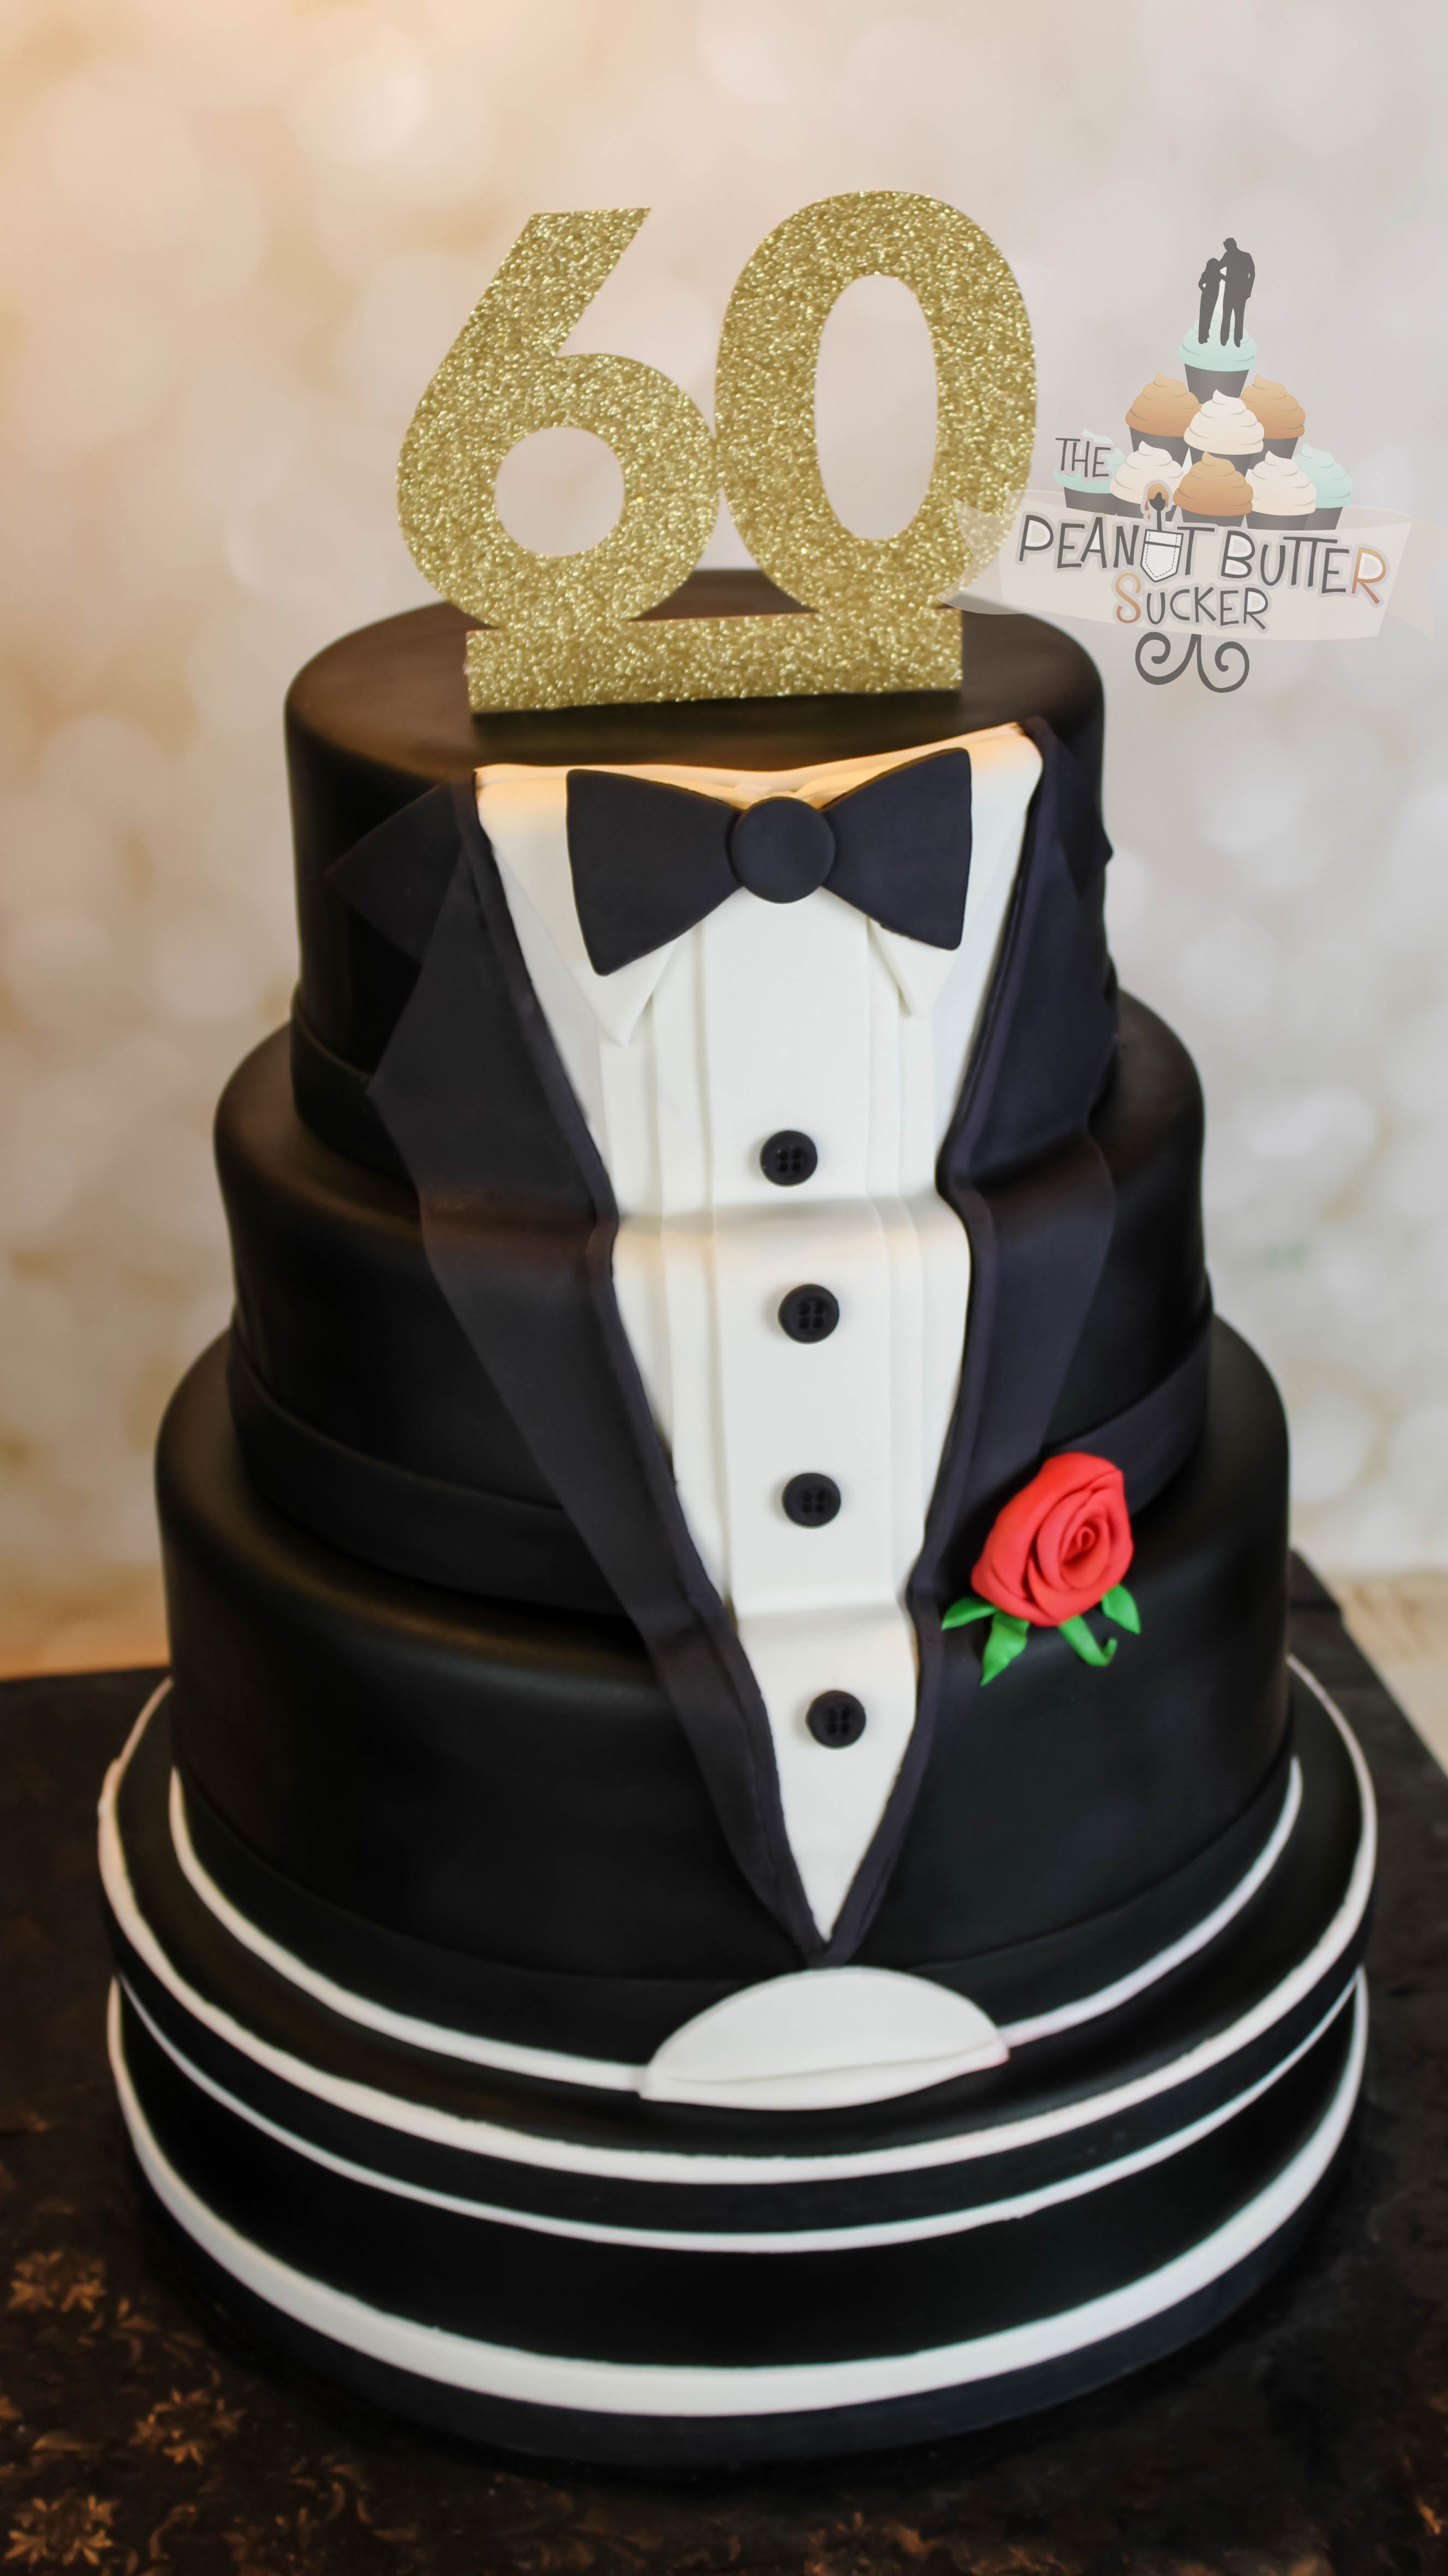 60 birthday cake ideas ae8abf8b19d52ebc43c86736176f8145